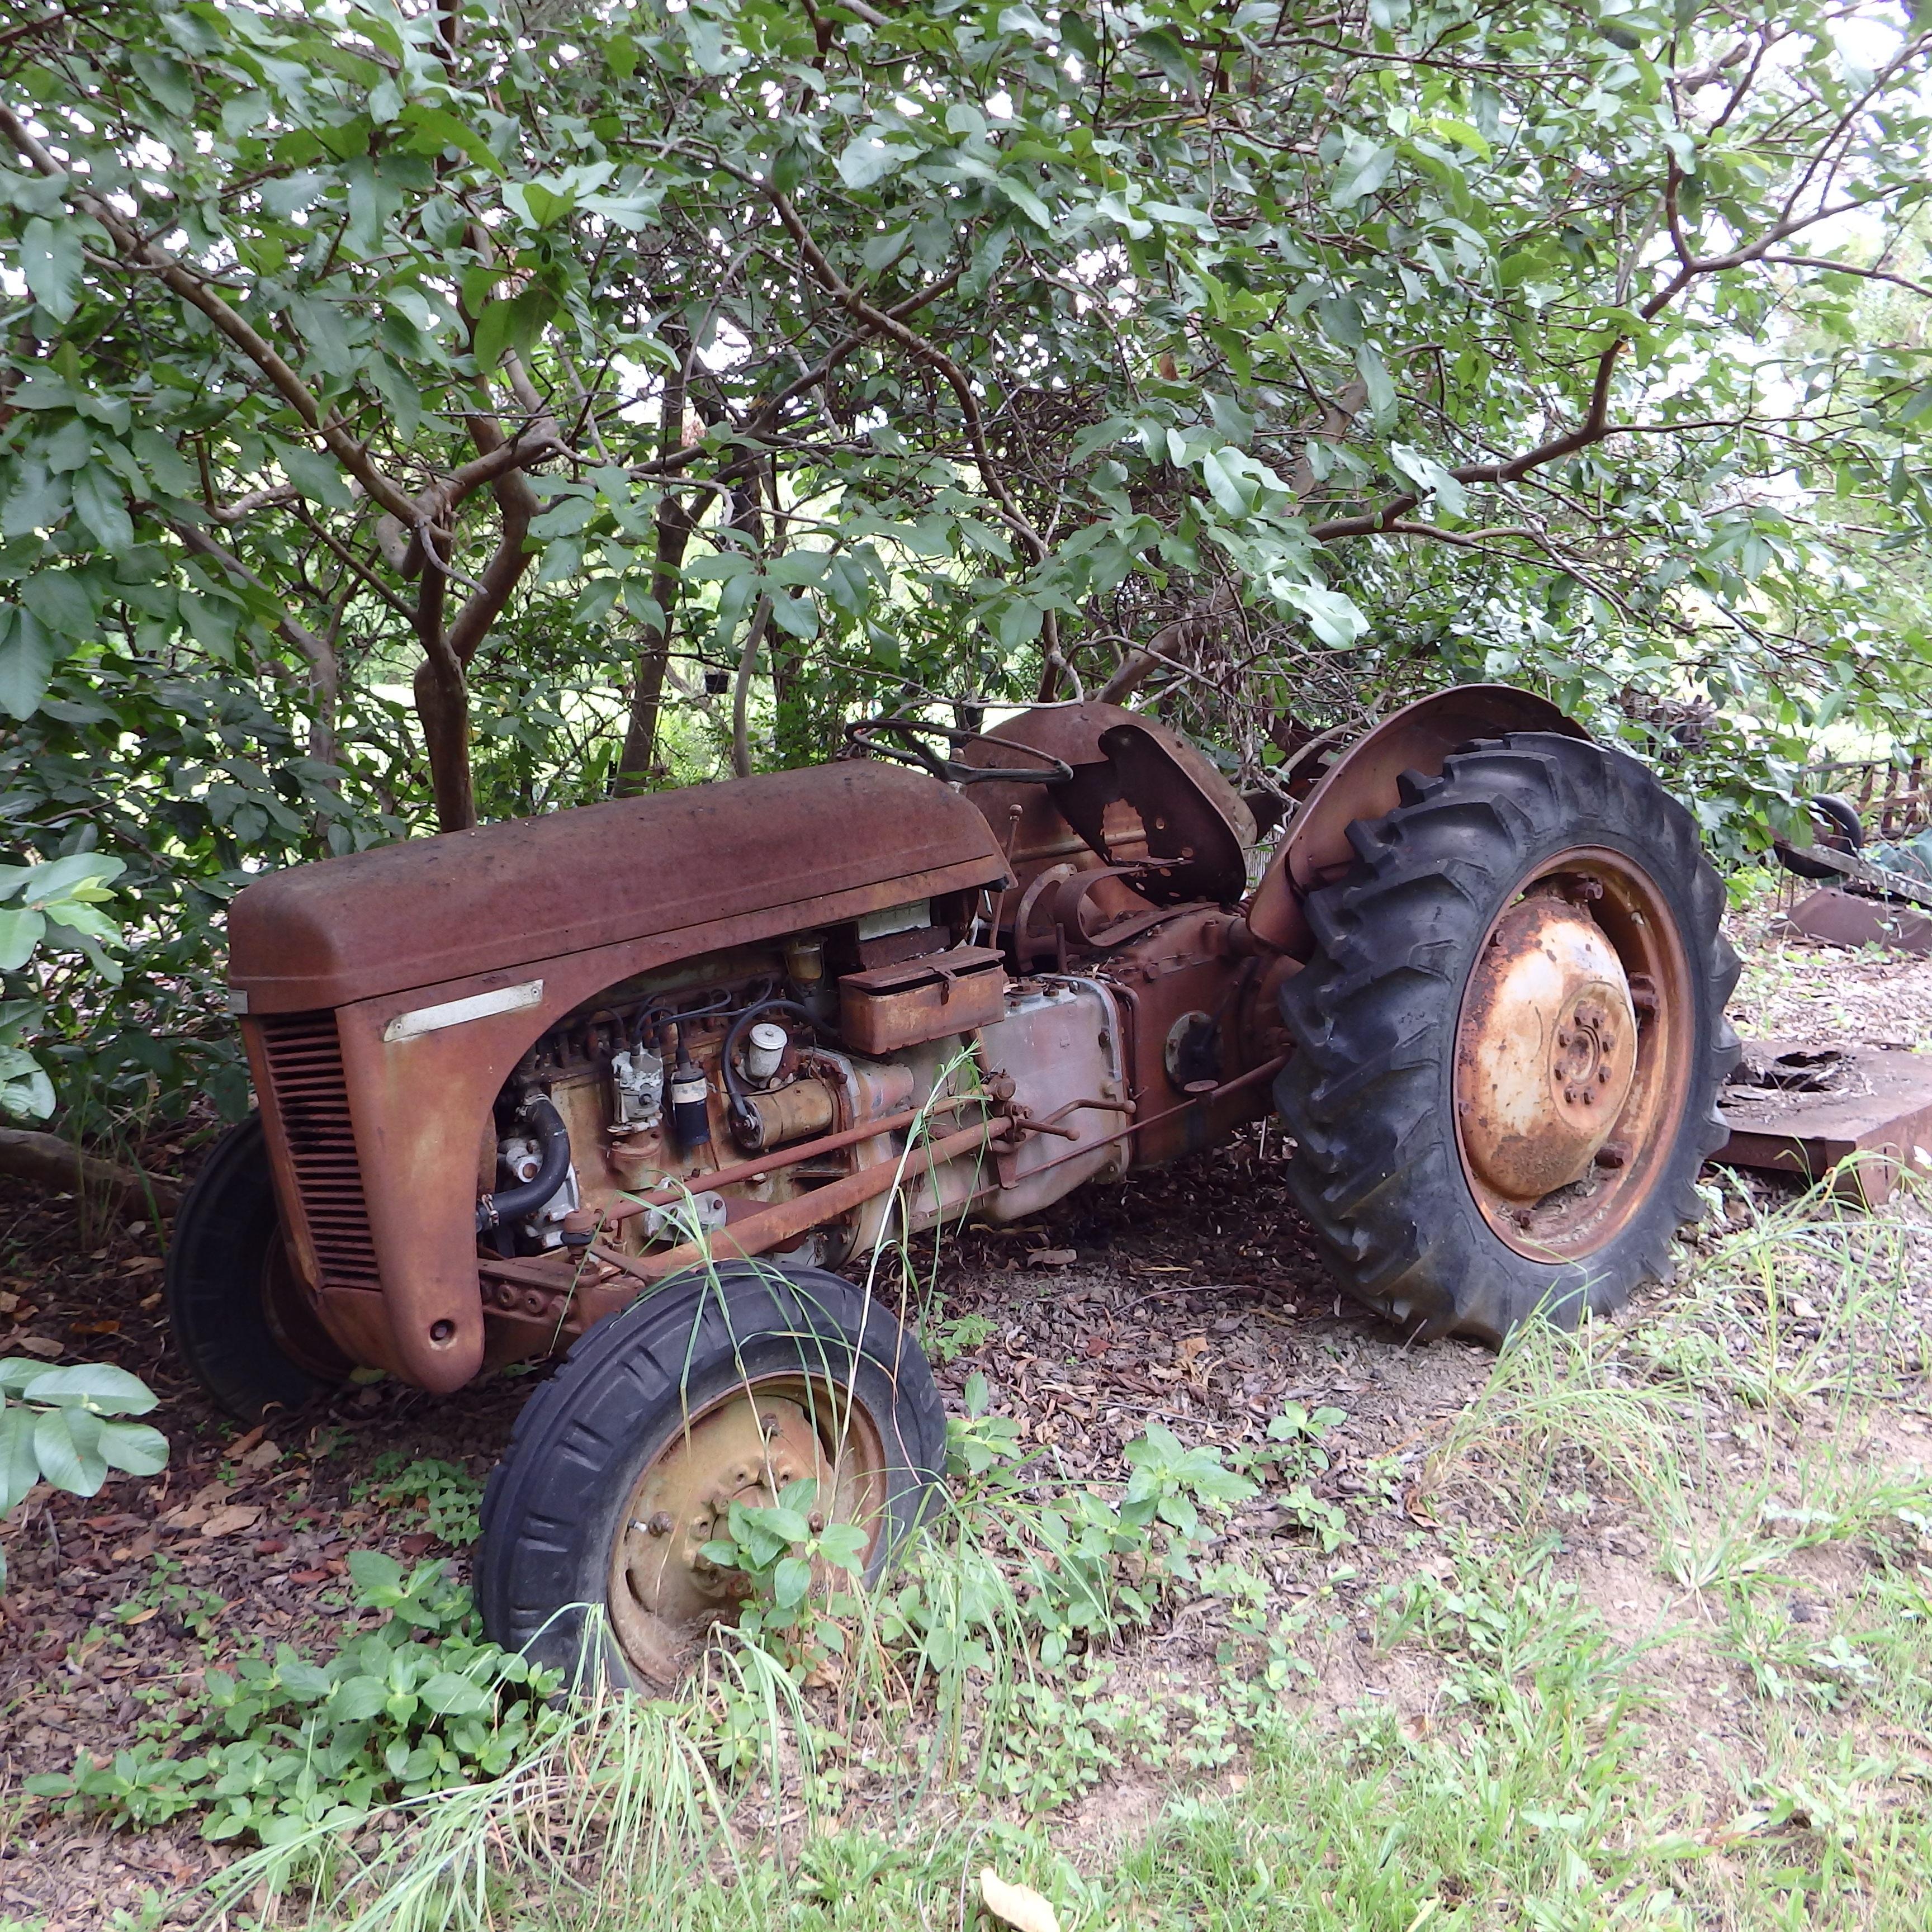 Tractor Broke Down : Free images tractor farm vintage antique wheel